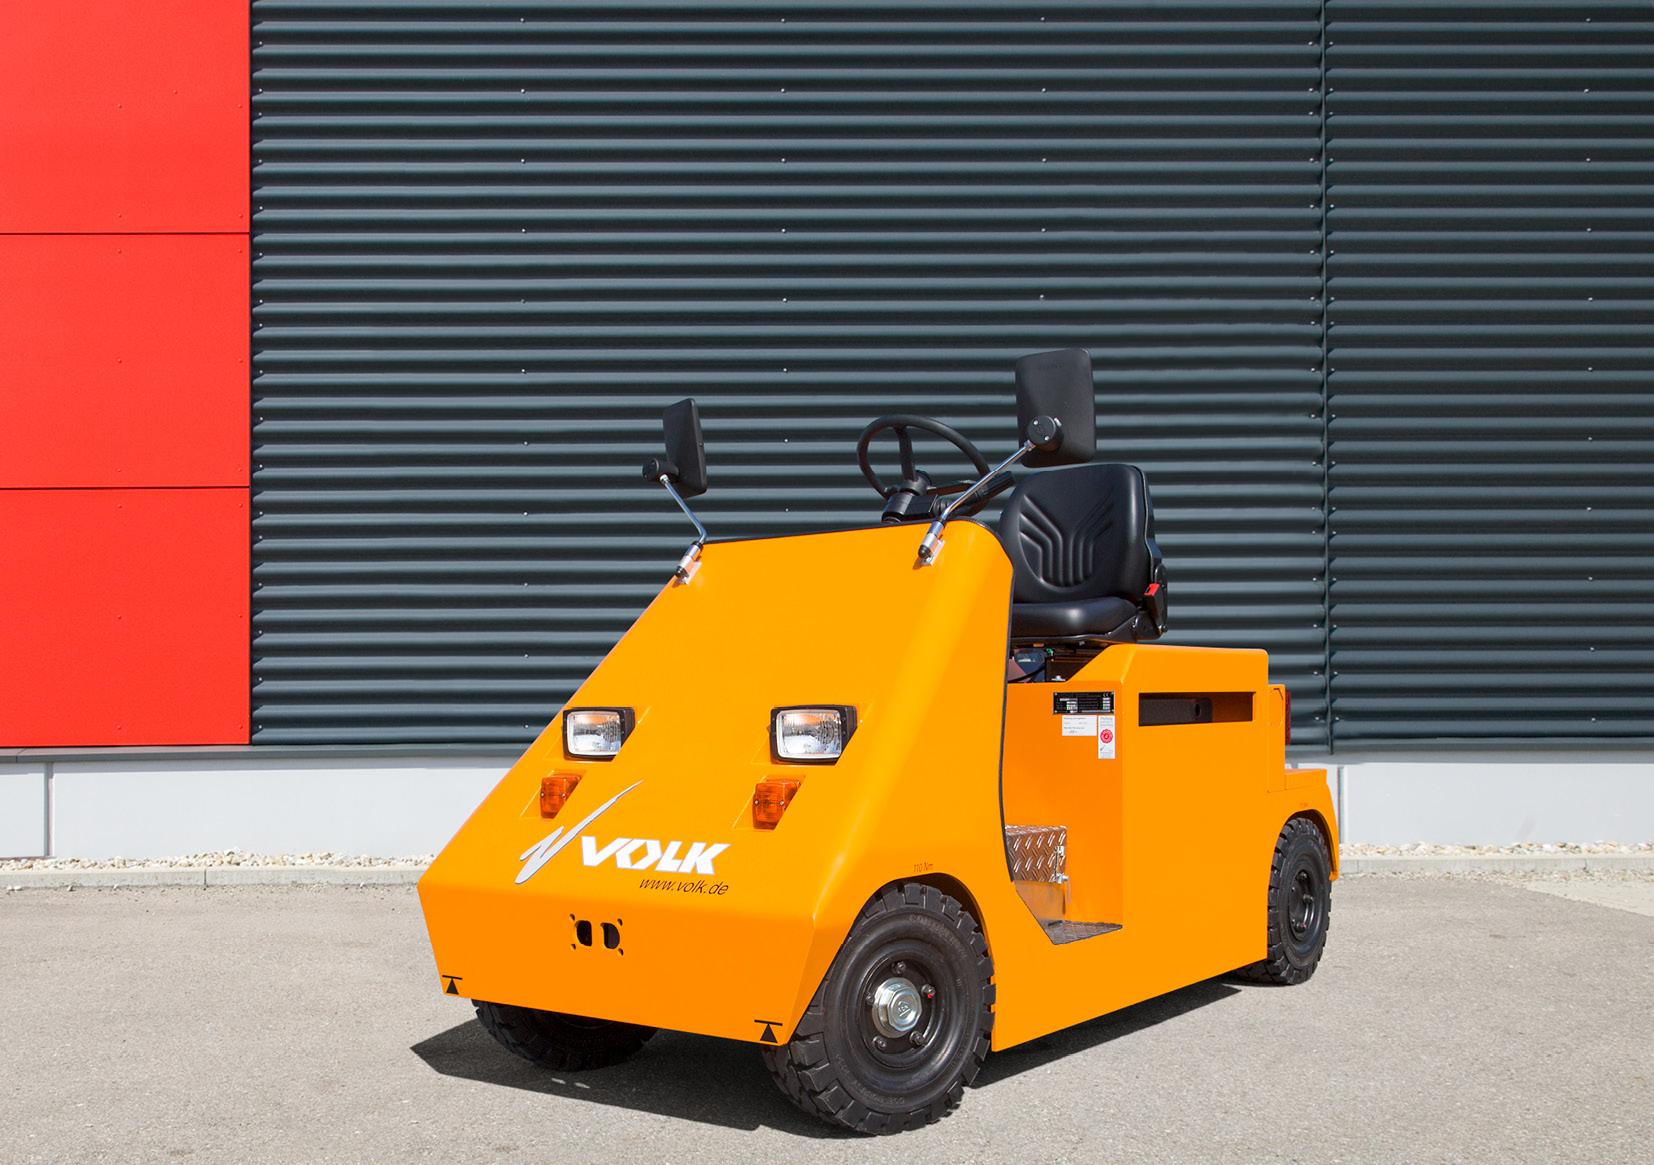 VOLK Electric tow tractor EFZ 12 K